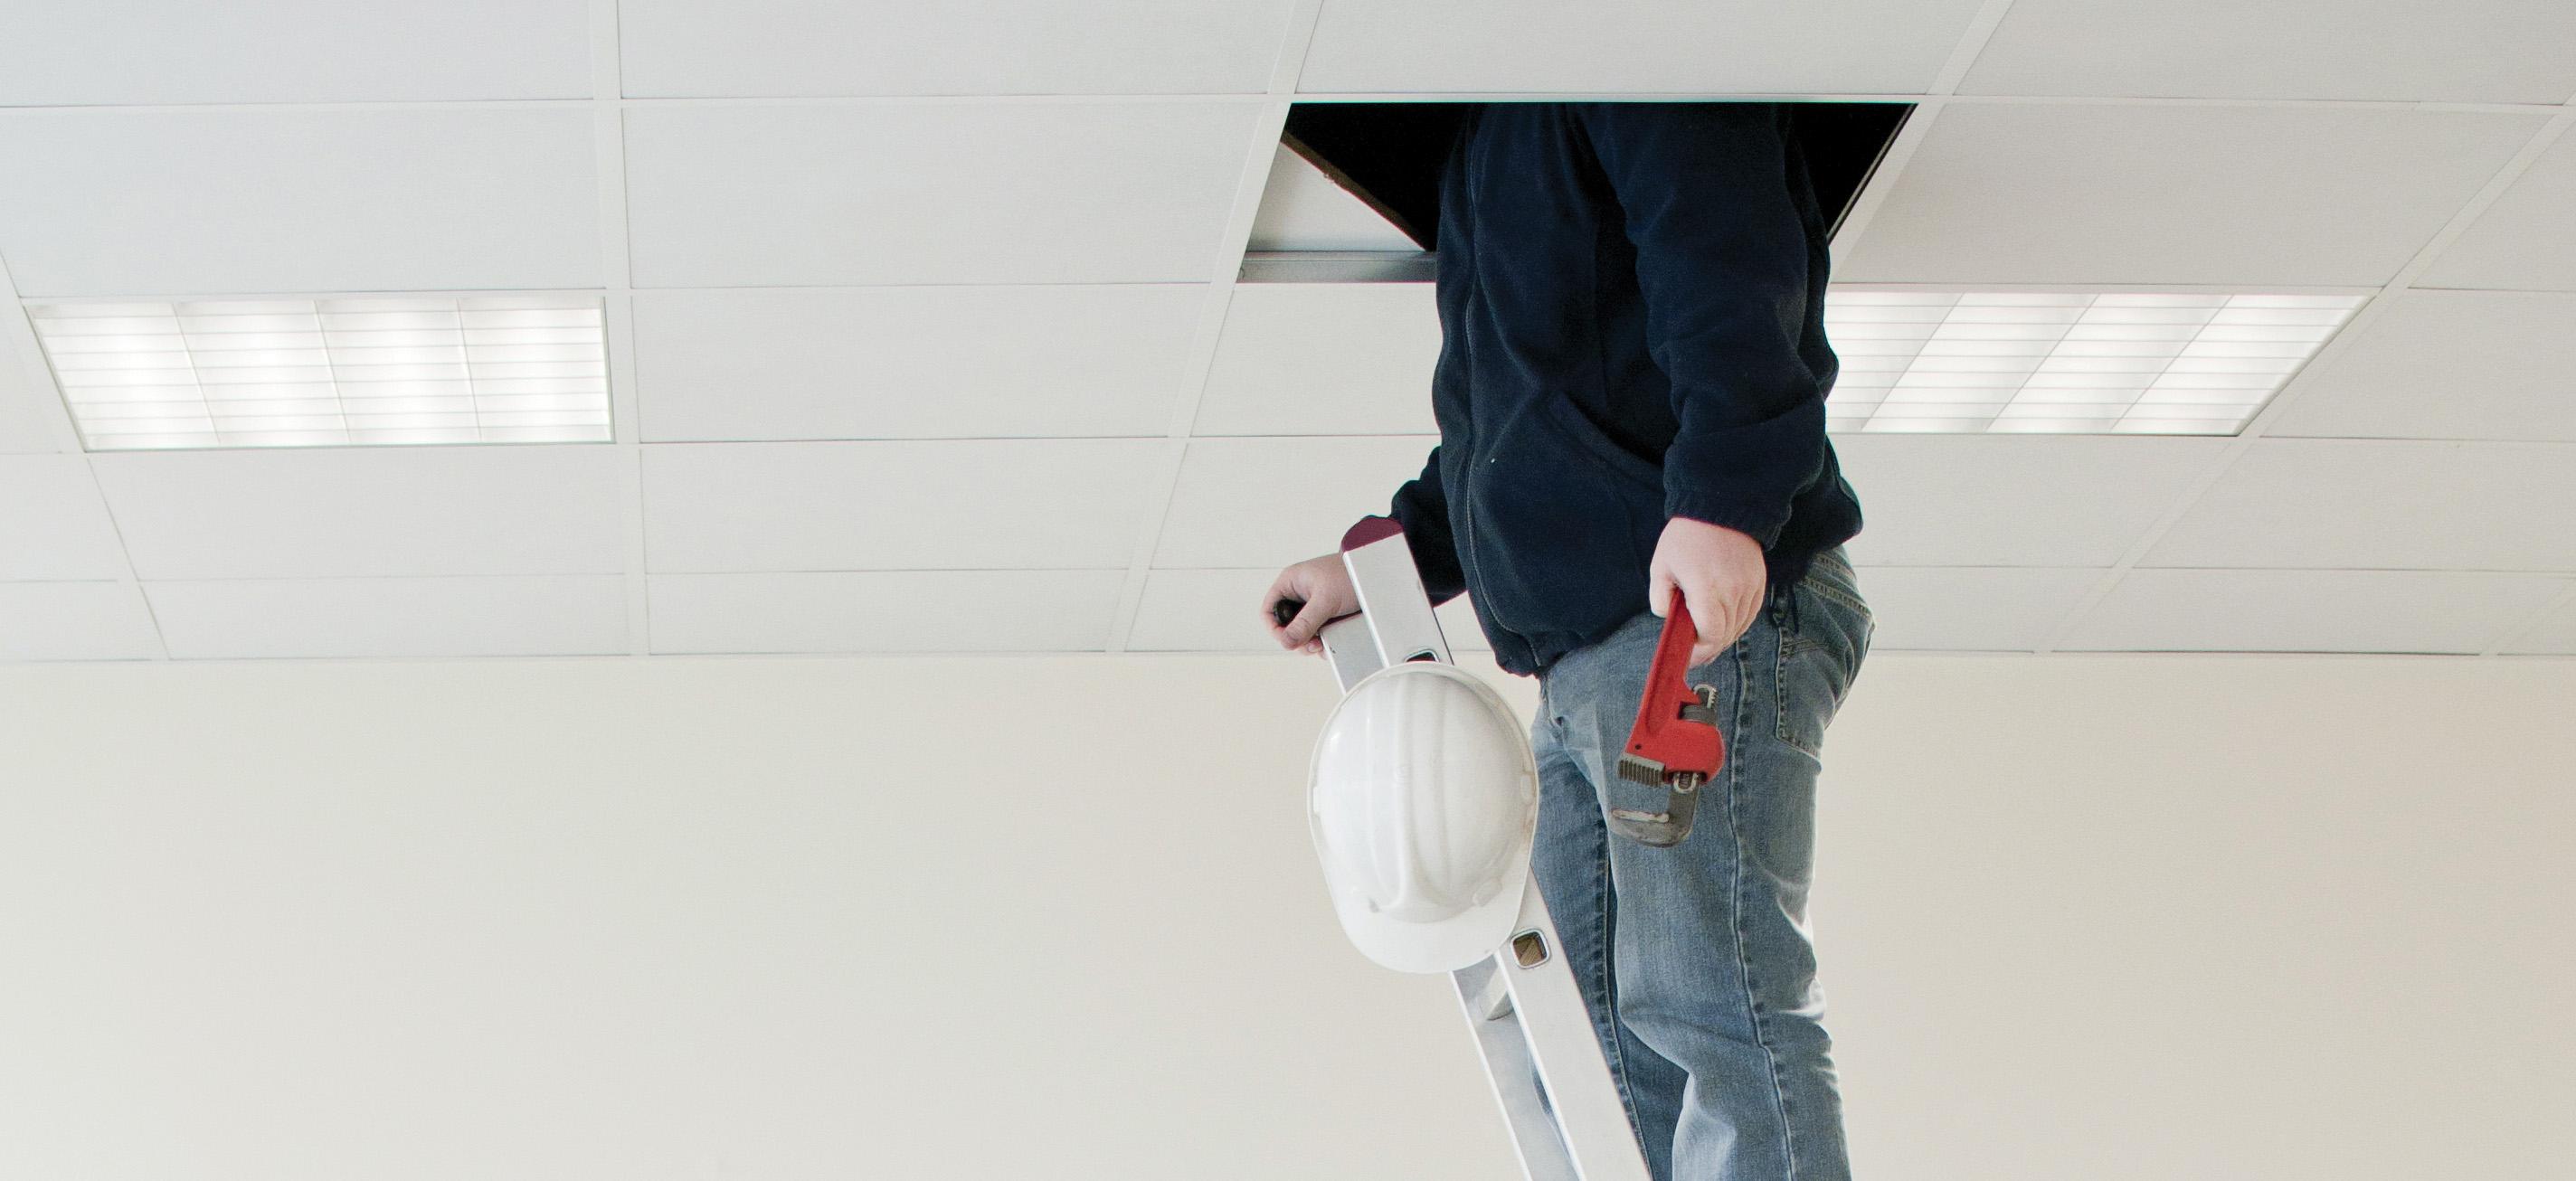 Improving maintenance workers' work standards